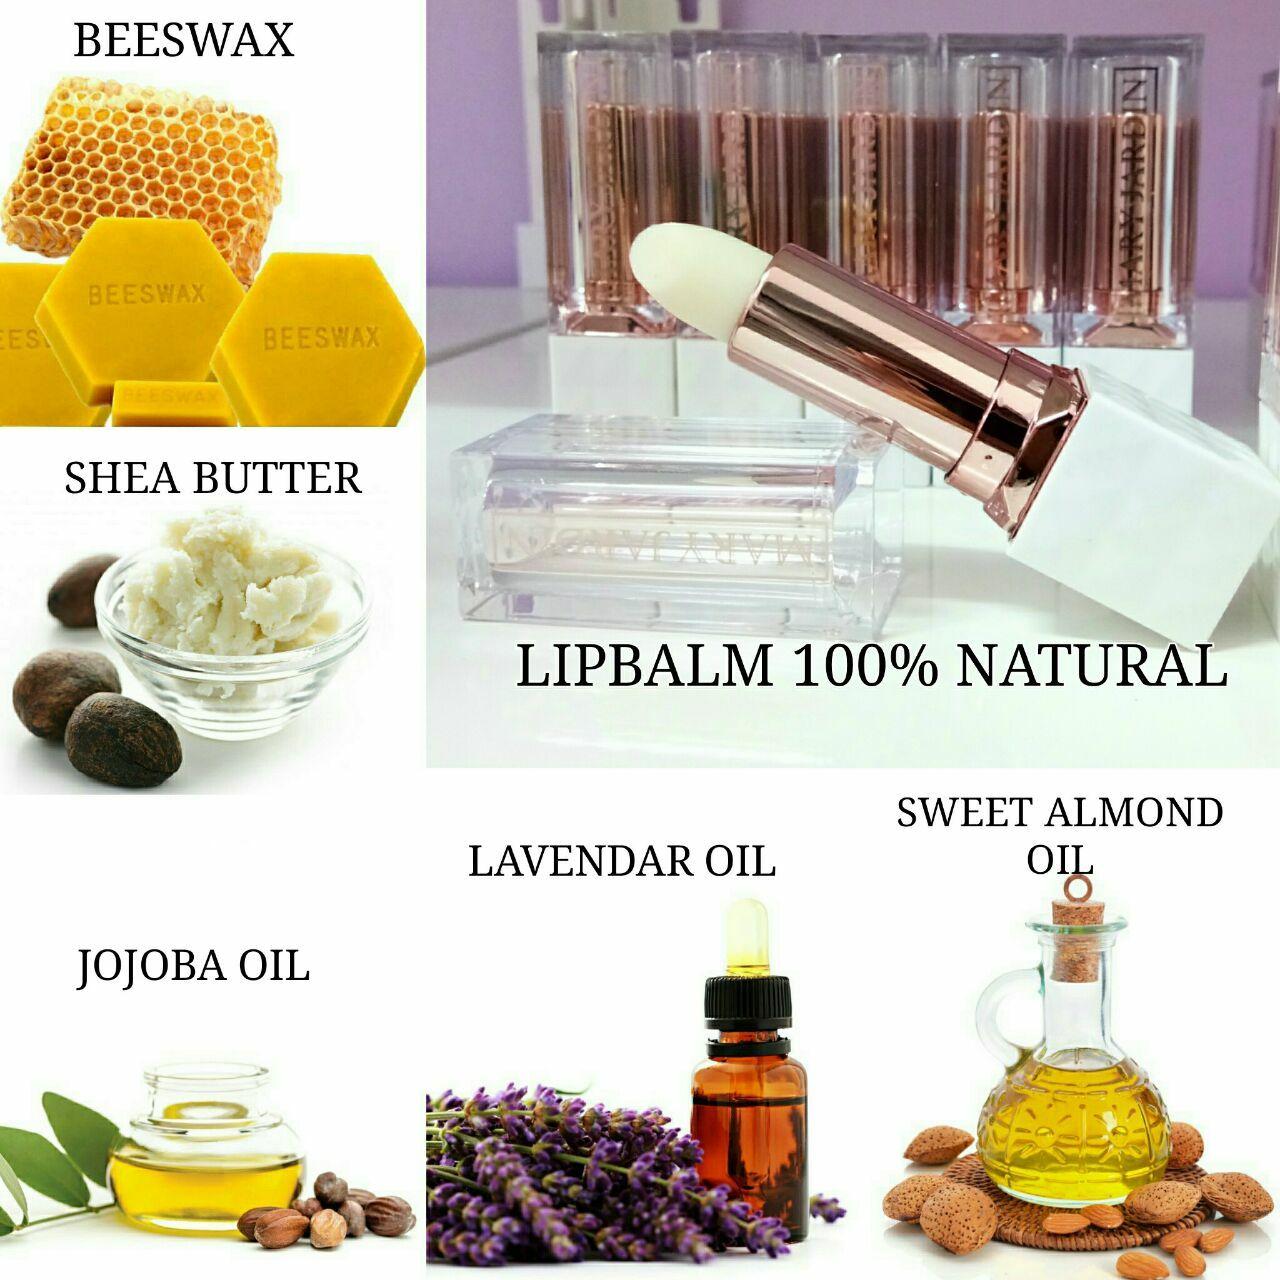 Manfaat Shea Butter Untuk Bibir Anda | MaryJardin.co